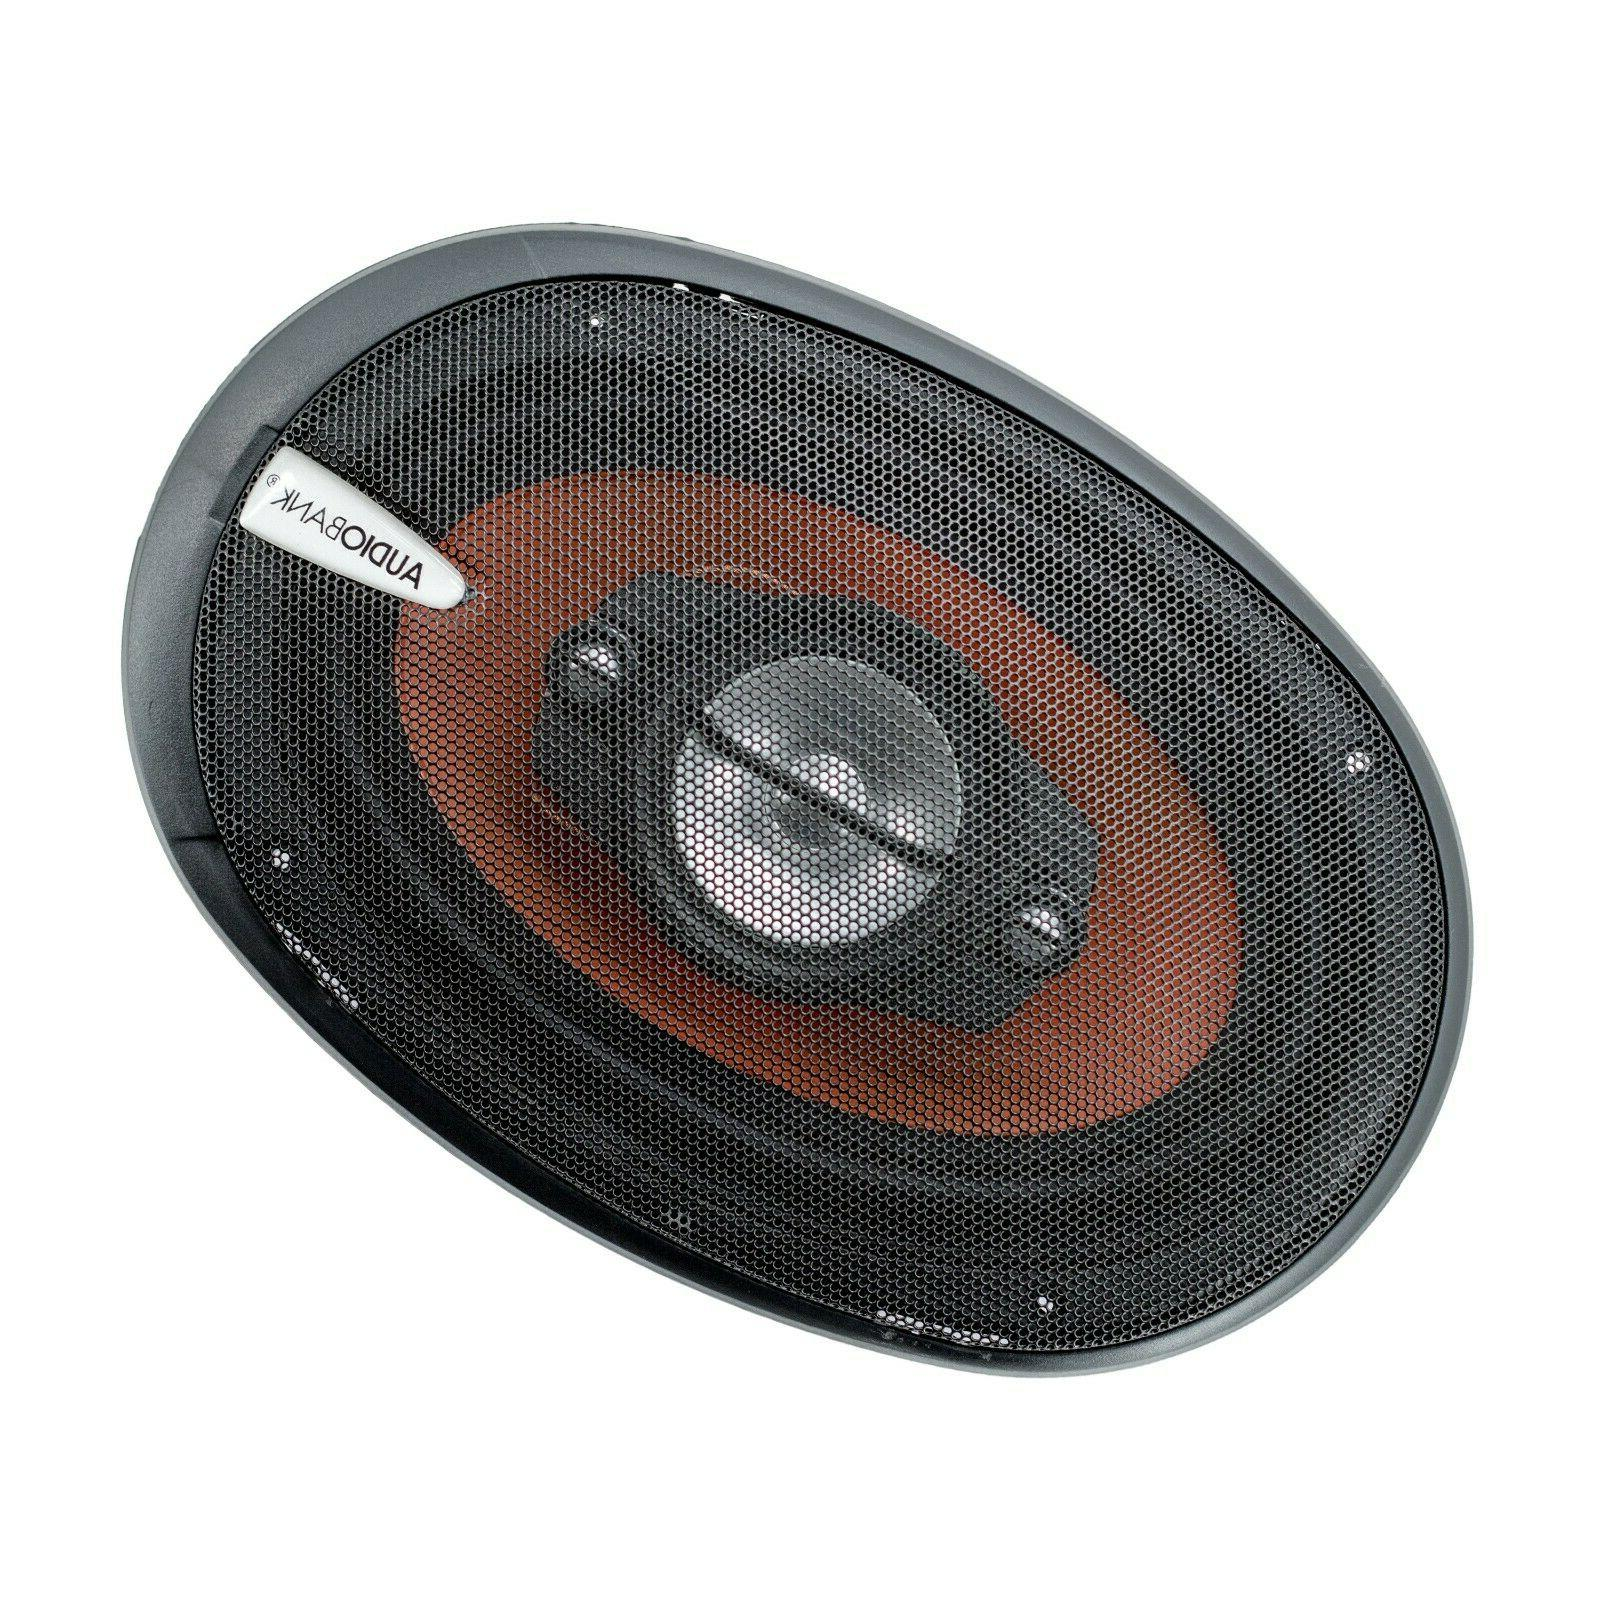 2) Watt 4-Way Stereo Speakers - AB790